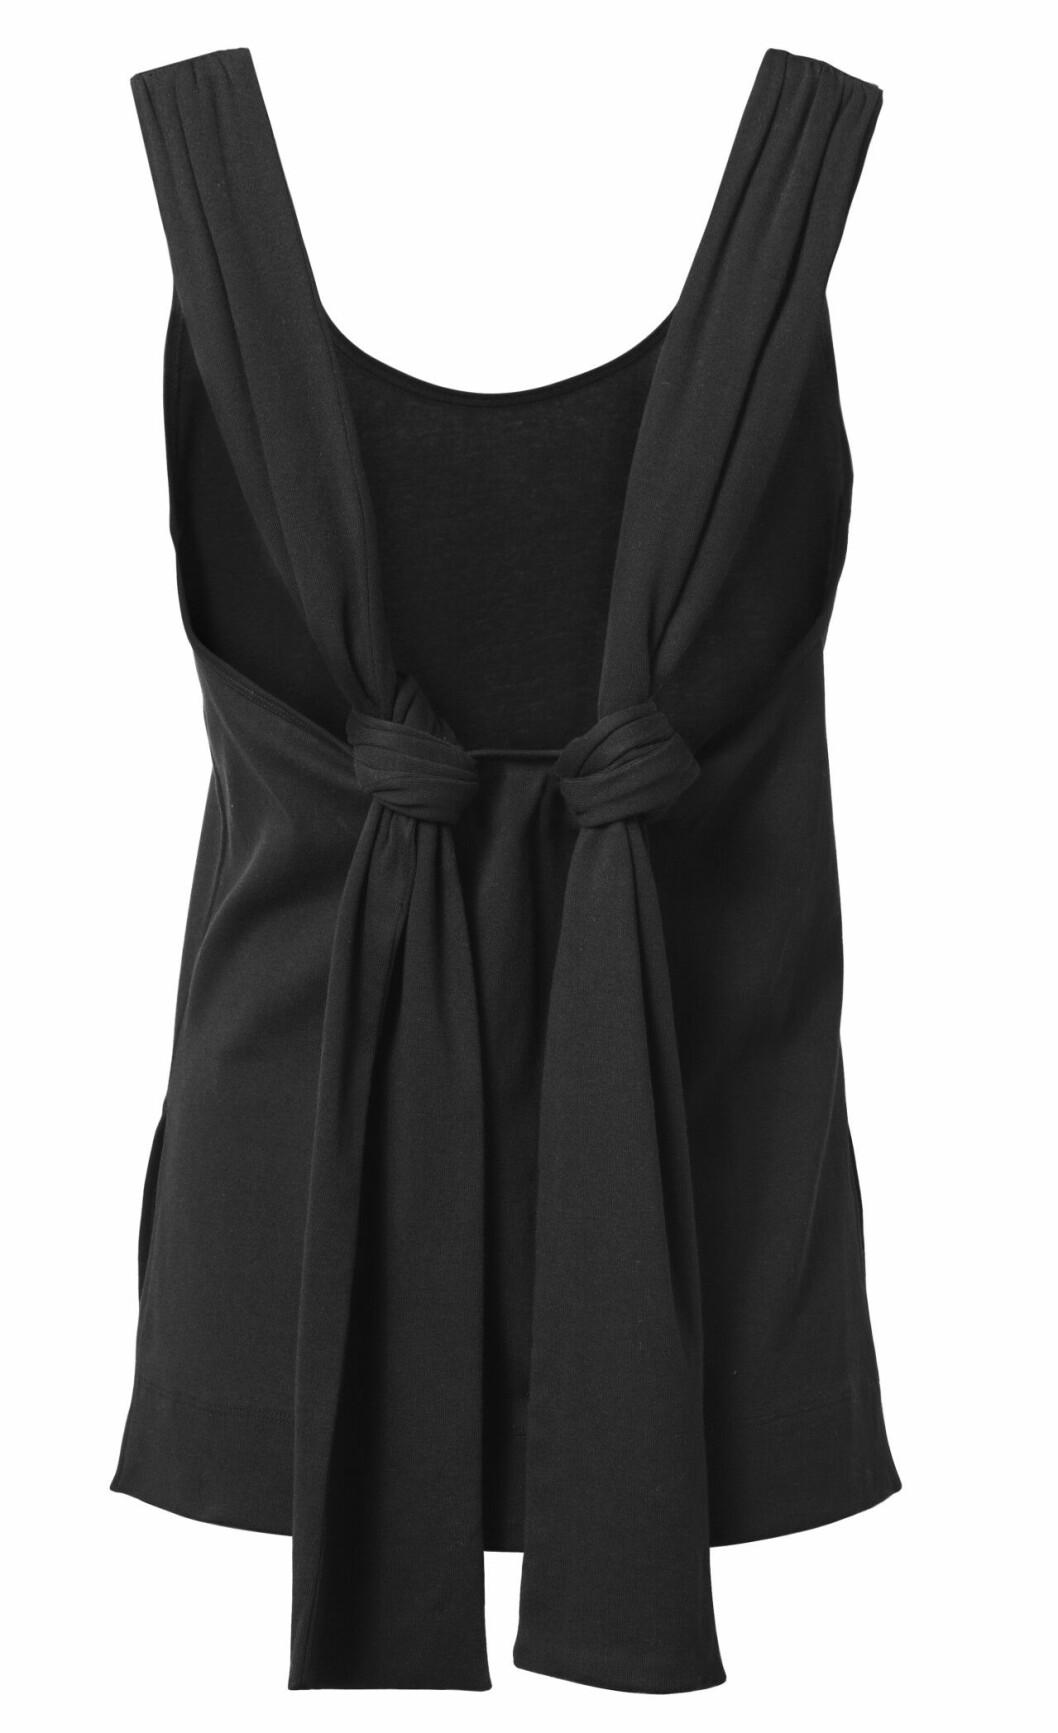 H&M conscious exclusive SS20 – svart linne